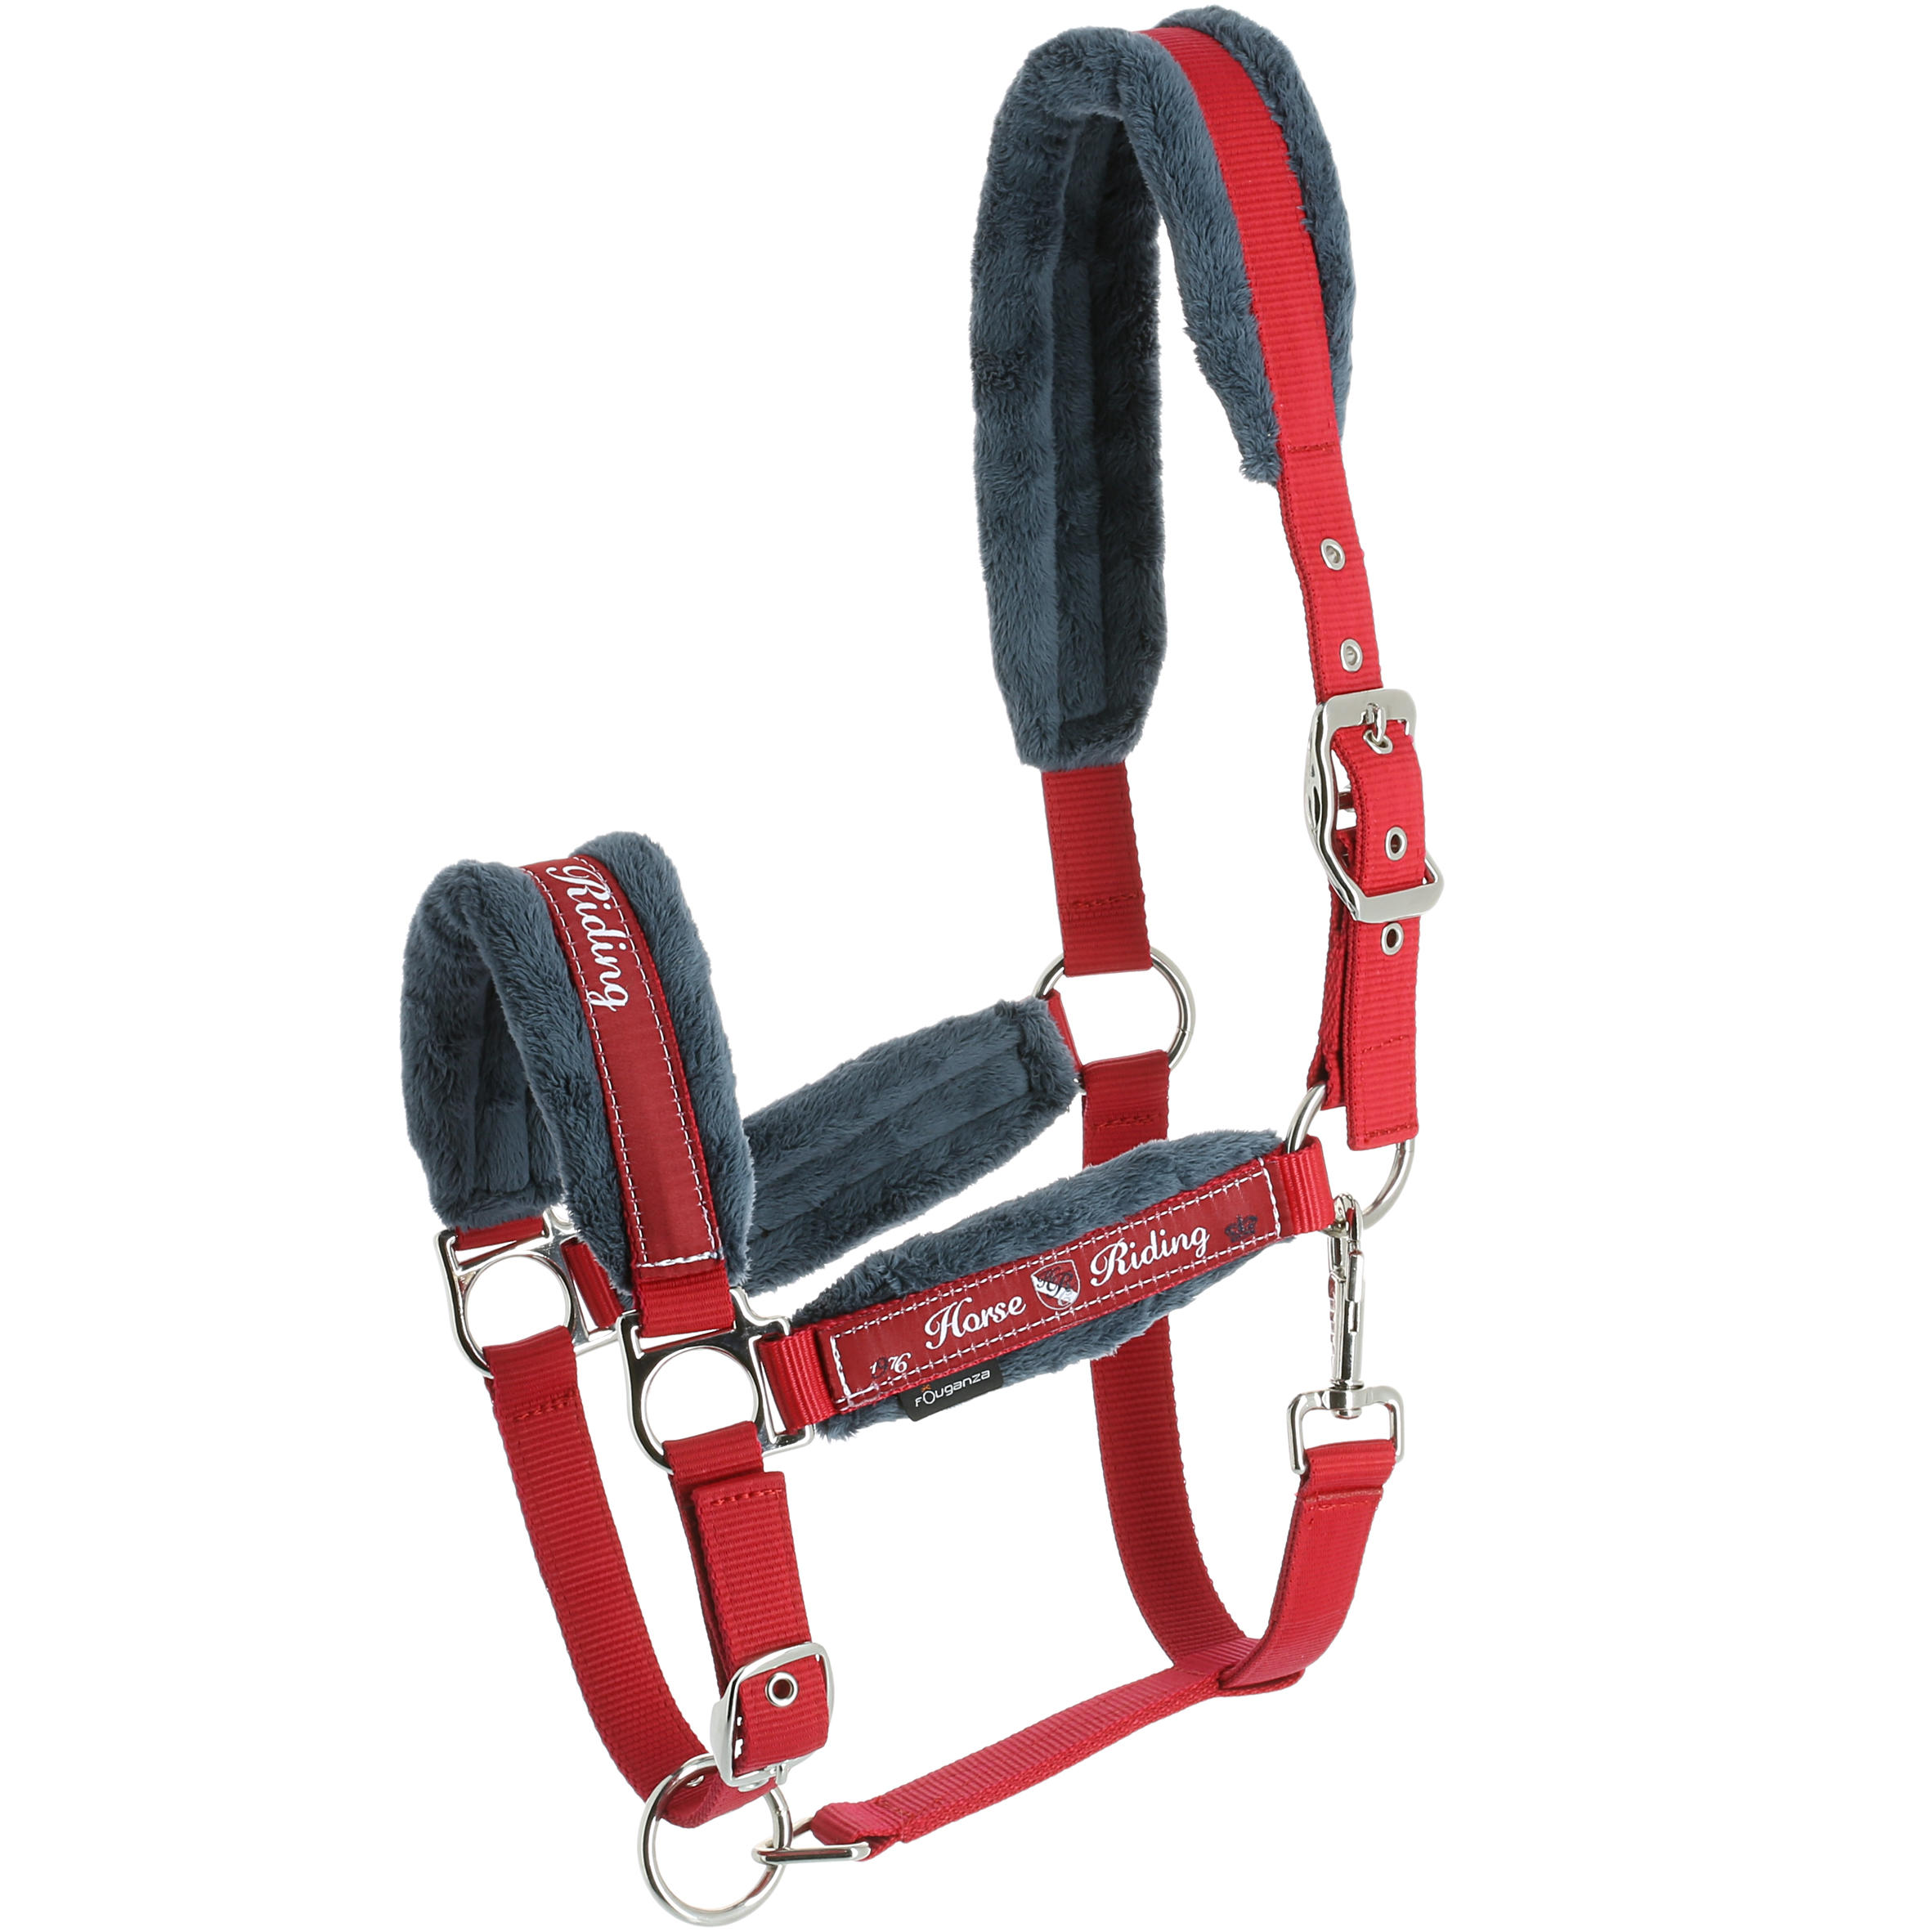 Winner Horse Riding Halter + Leadrope Set For Horse Or Pony - Navy Blue